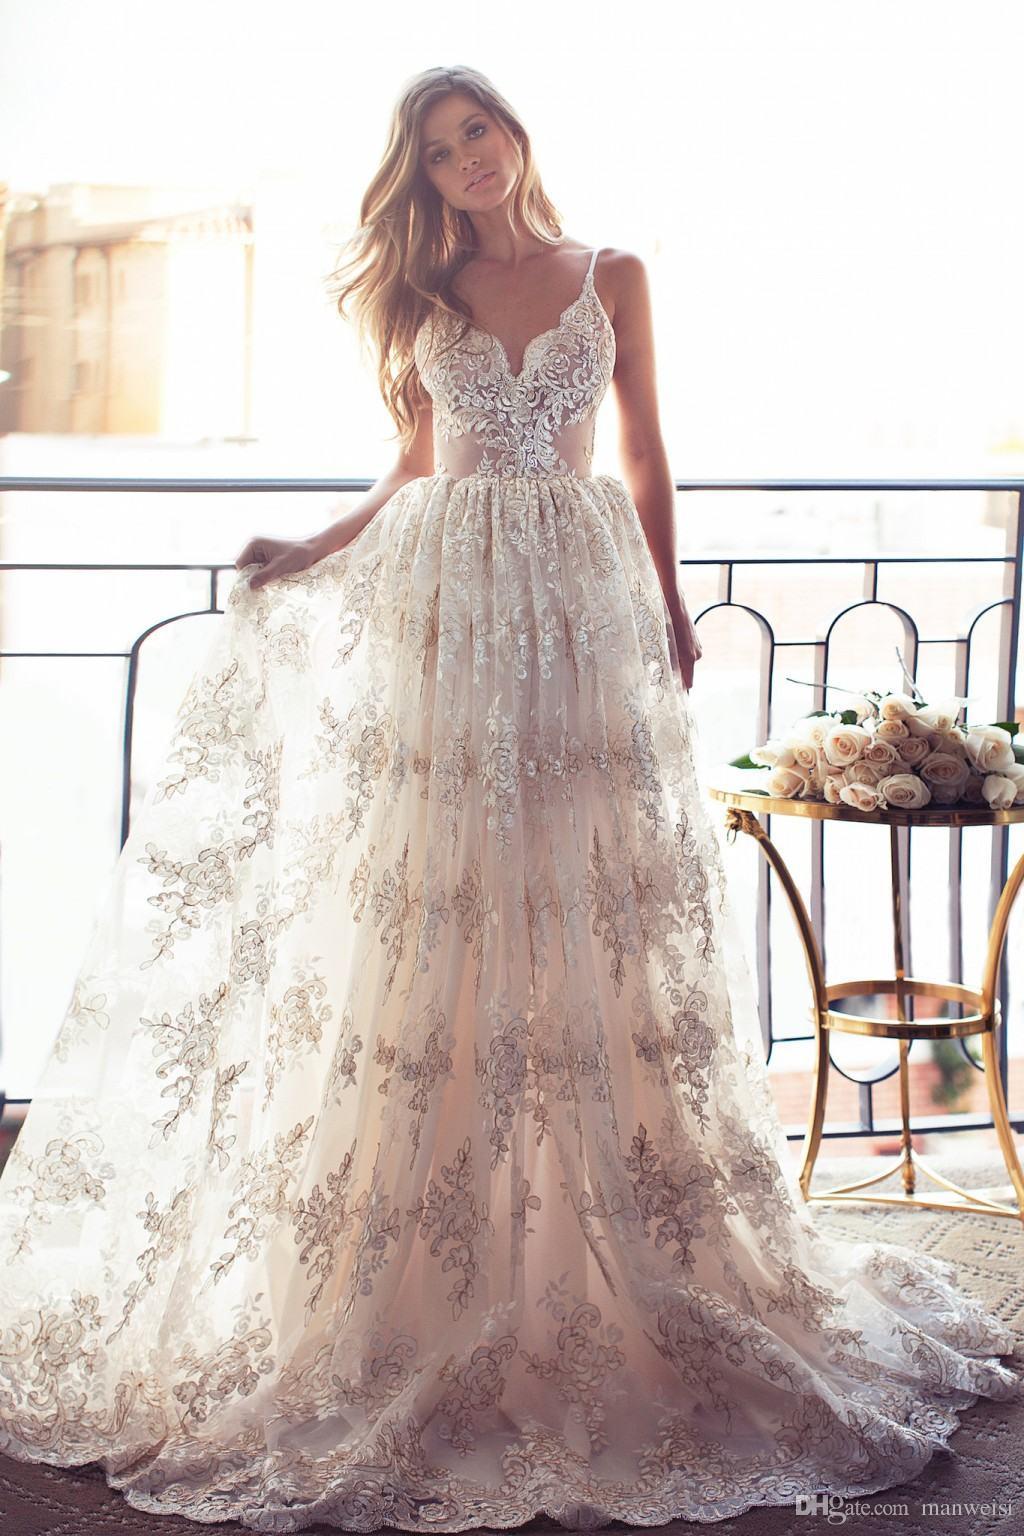 Romantic a line strapless long lace wedding dress modsele romantic a line strapless long lace wedding dress thumbnail 1 ombrellifo Images